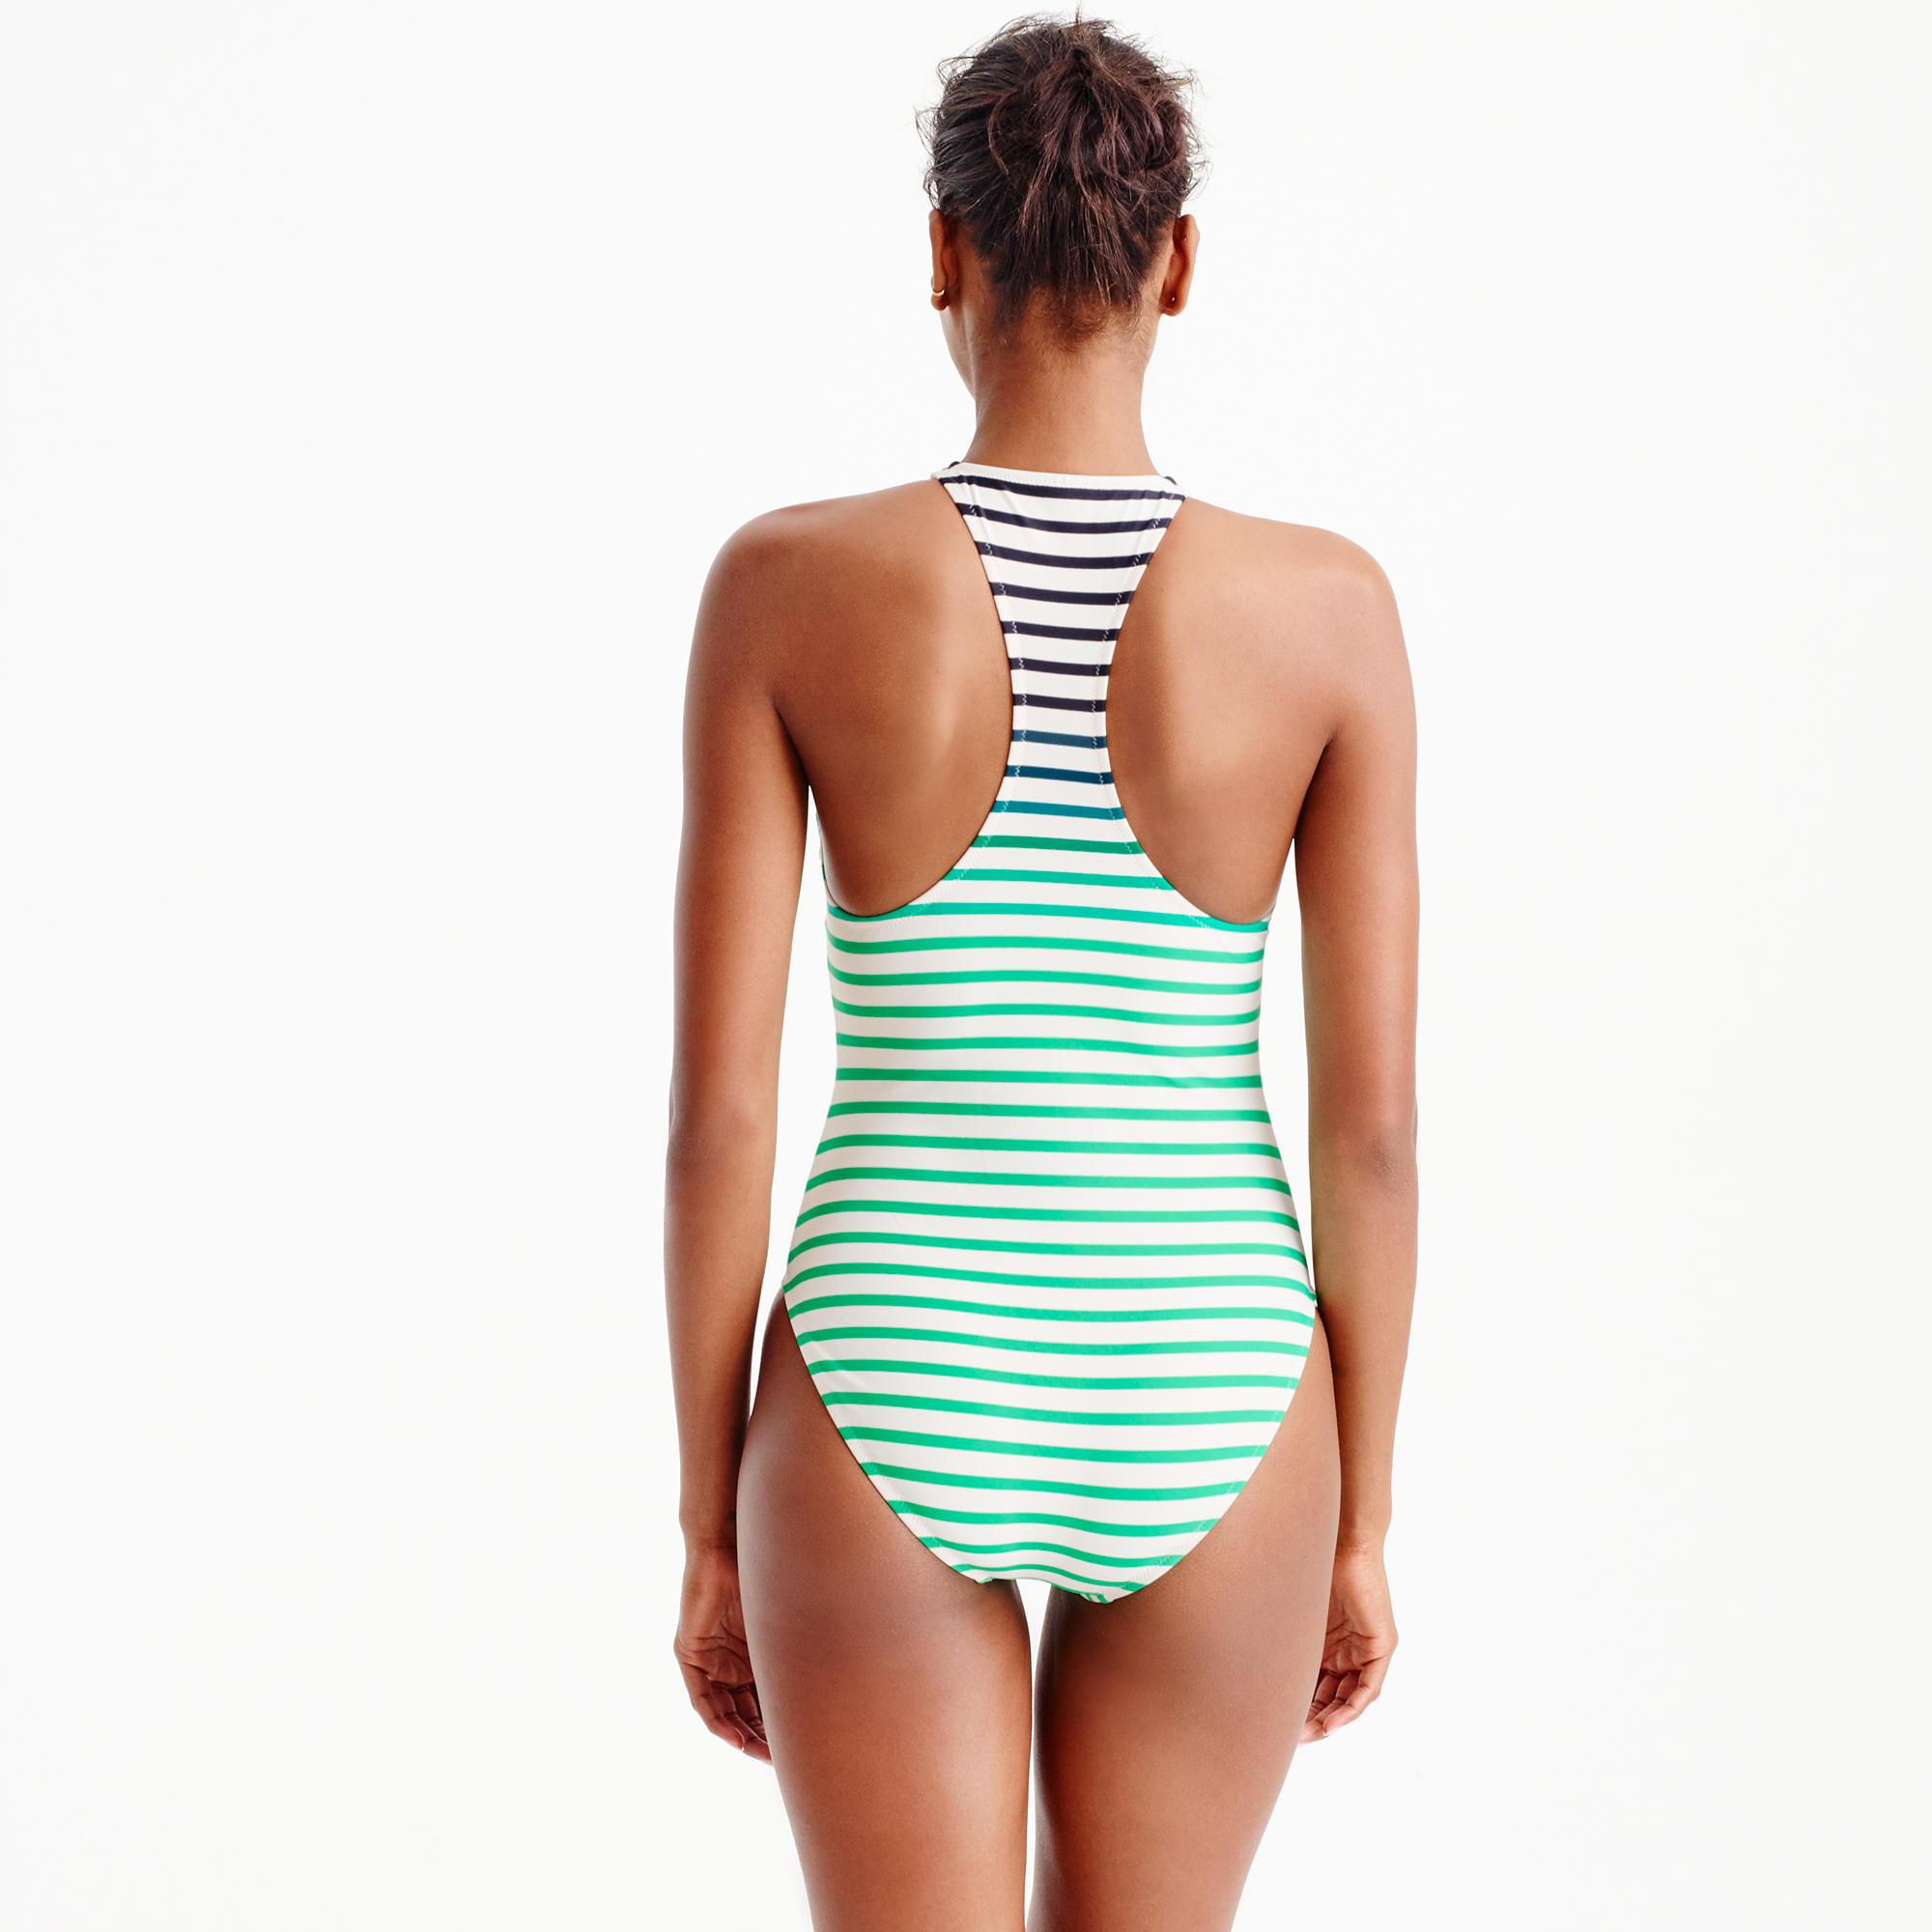 7dfa70bc18 J.Crew Zip-front One-piece Swimsuit In Ombré Stripe in Green - Lyst